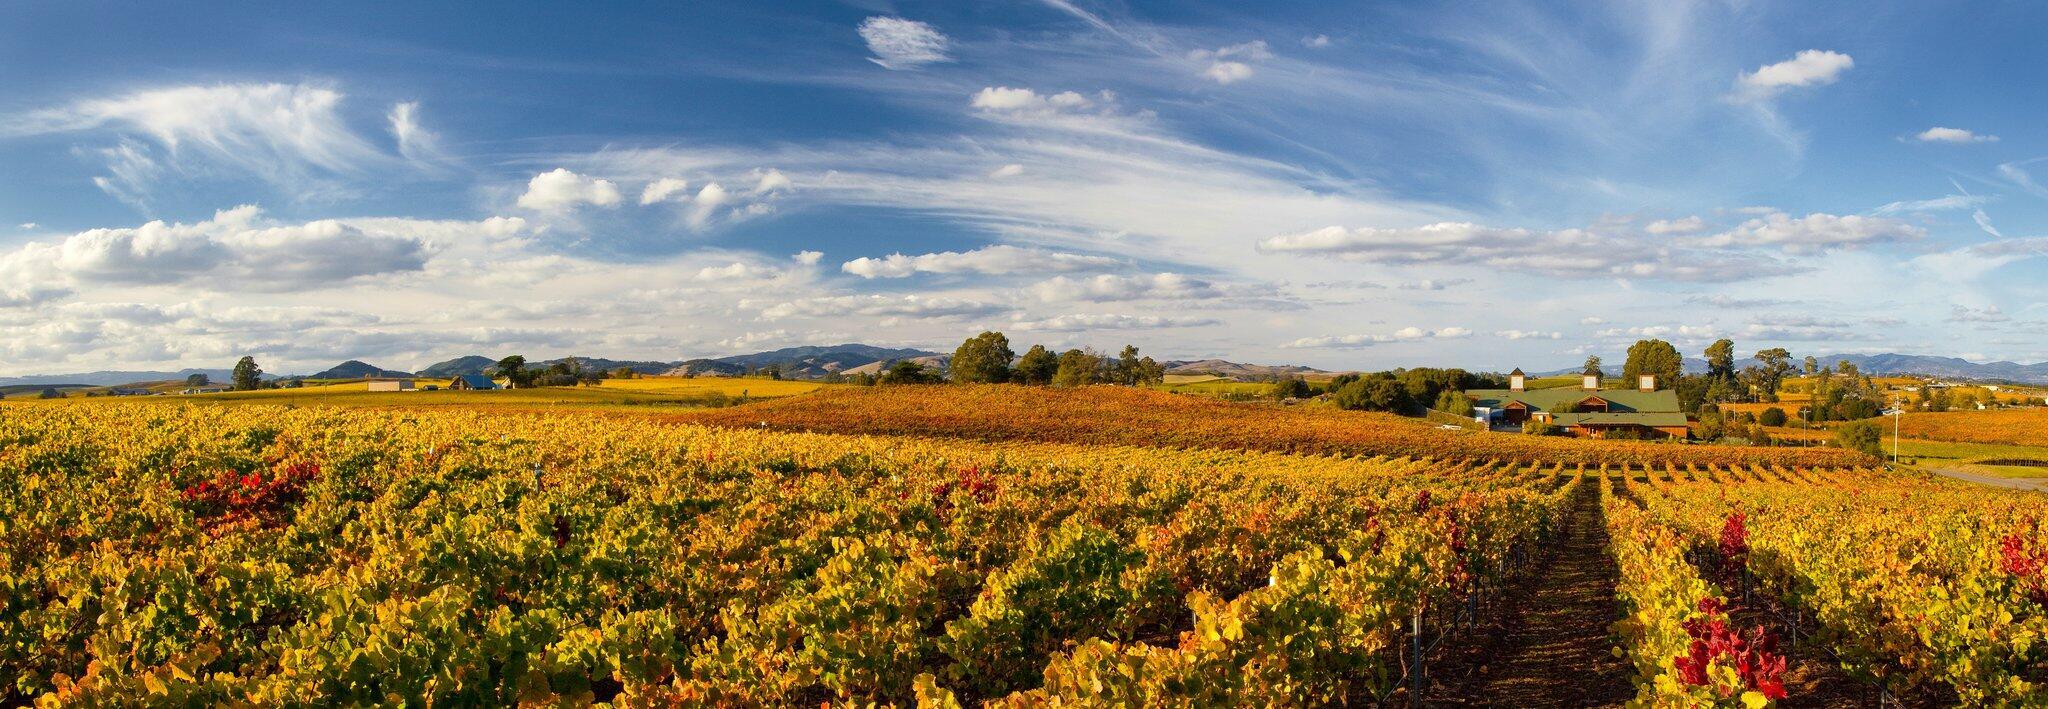 Bouchaine Vineyards Cover Image